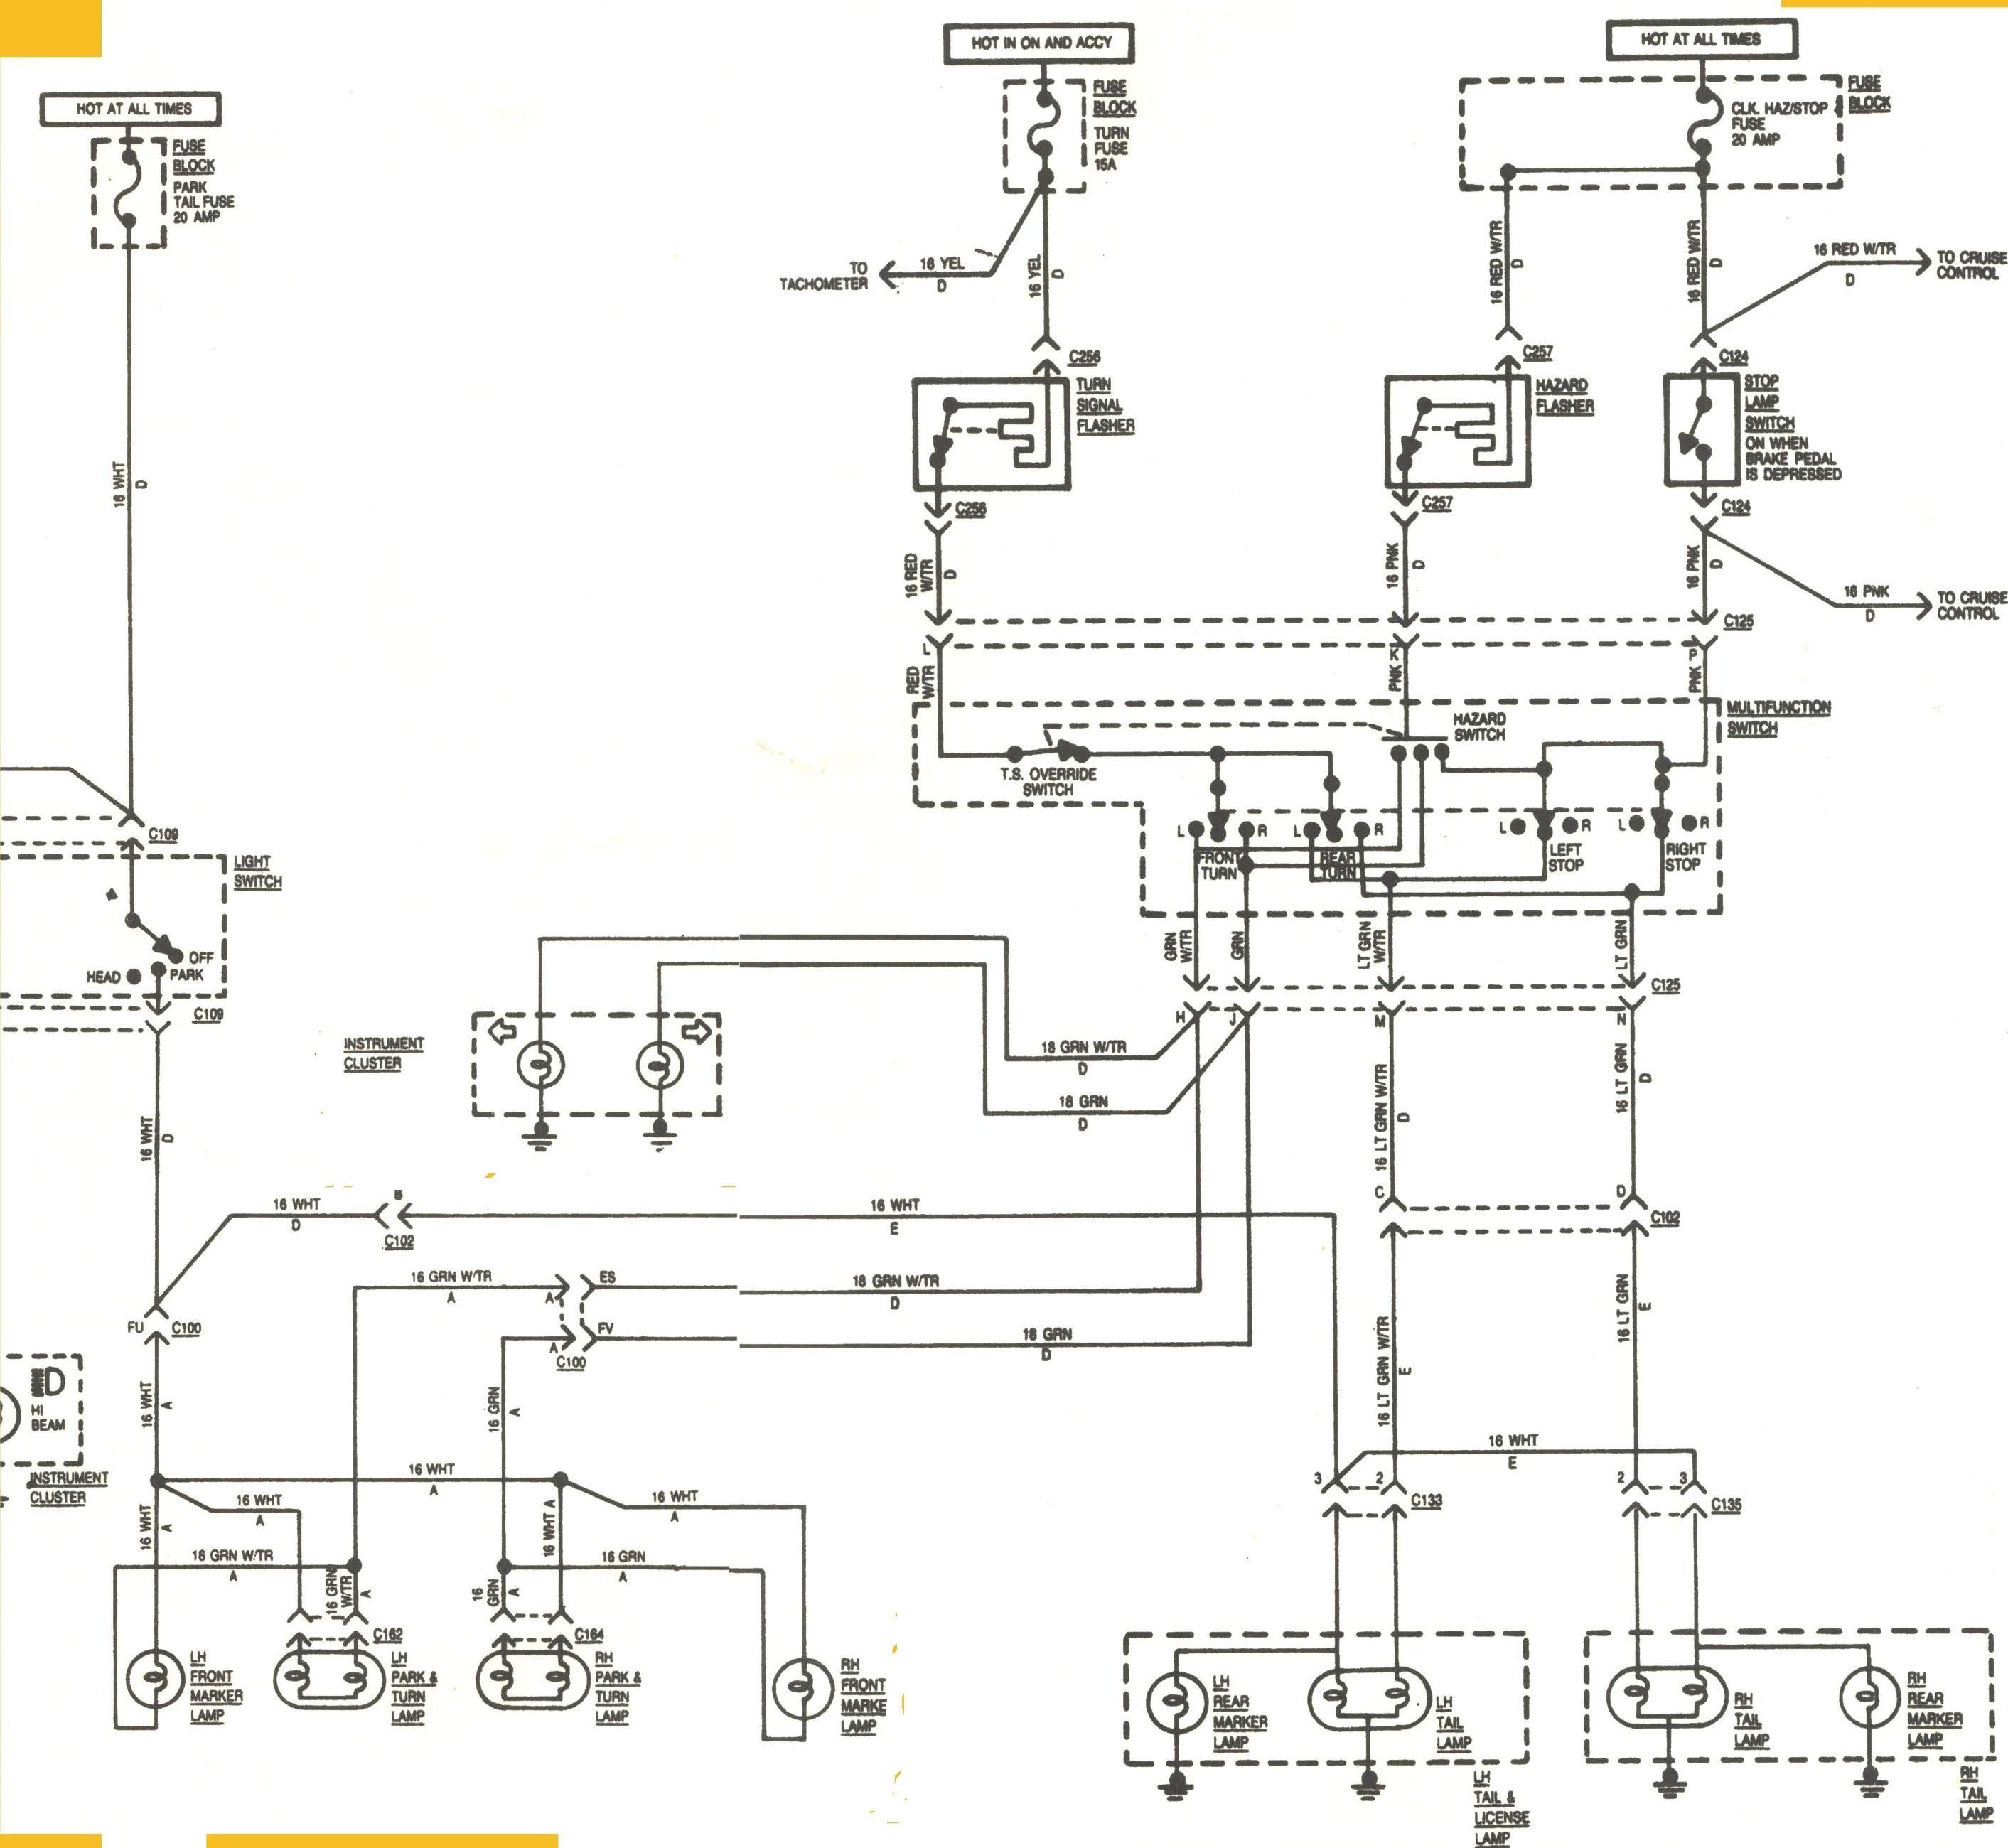 2007 Jeep Liberty Radio Wiring Schematic. . Wiring Diagram  Jeep Liberty Stereo Wiring Schematic on